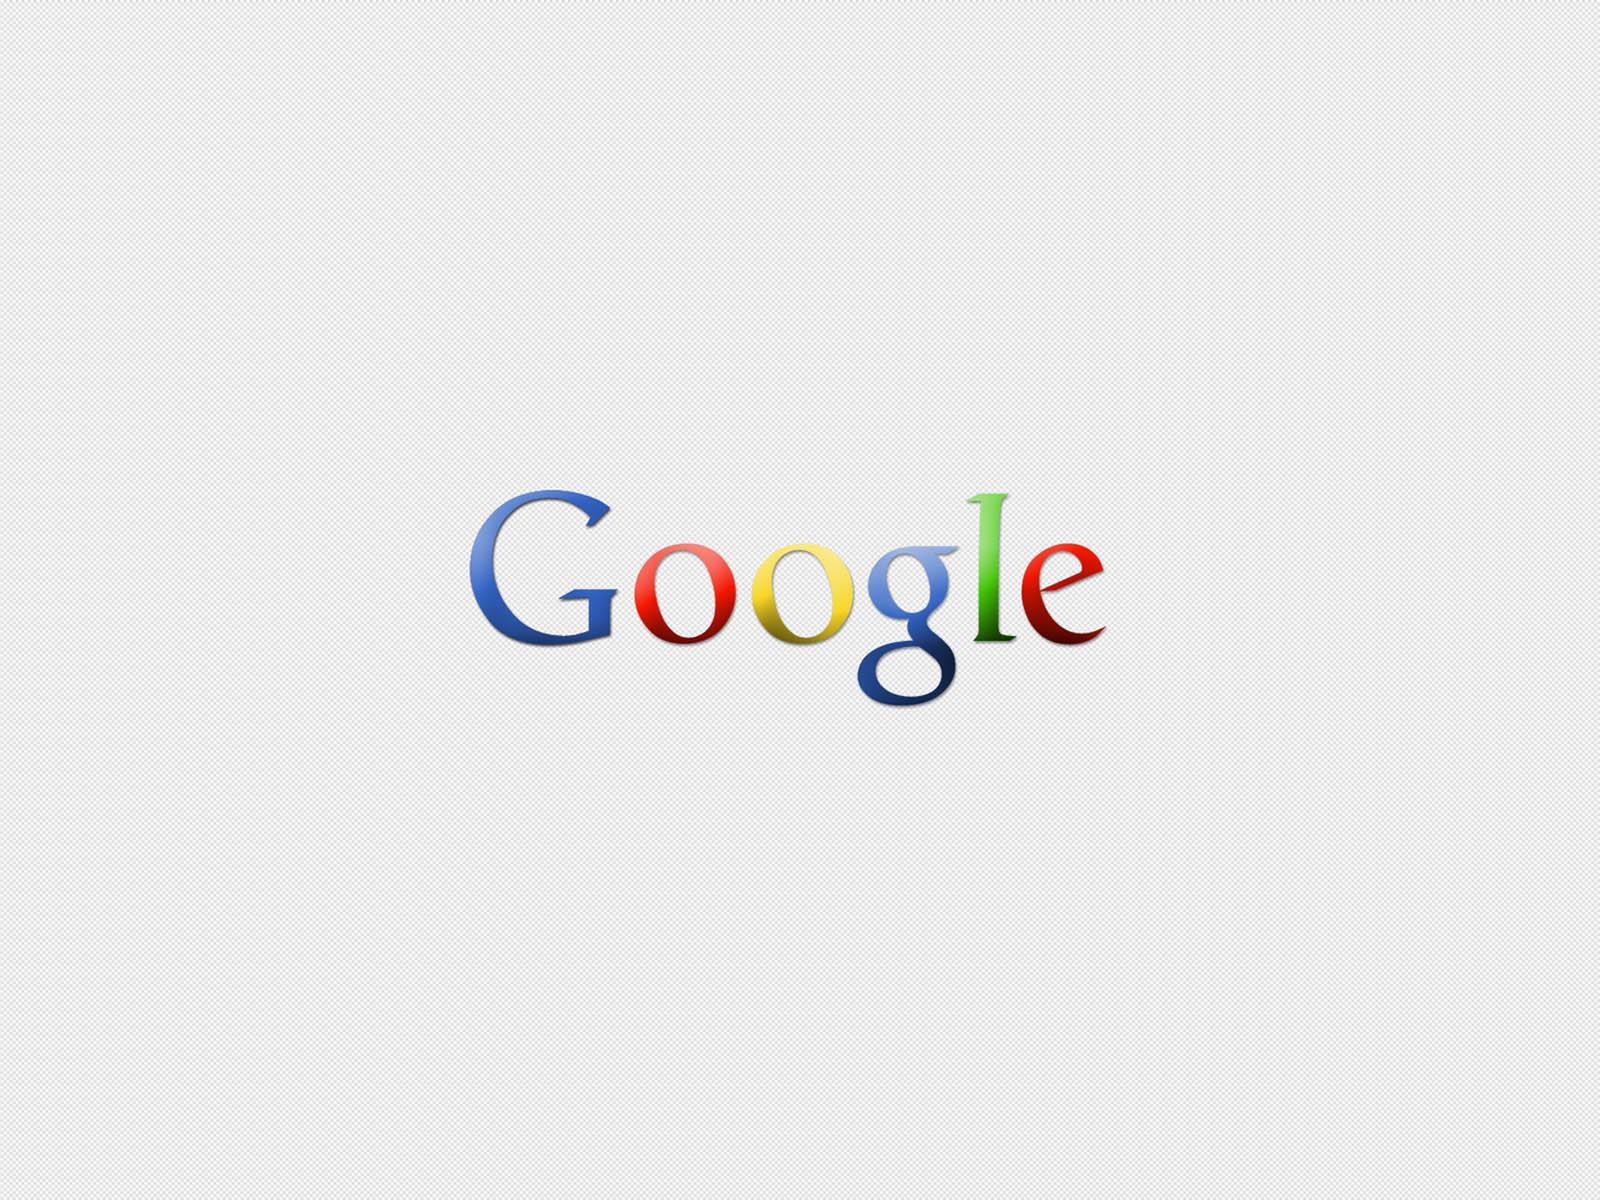 Google Backgrounds And Wallpapers ~ Desktop Wallpaper